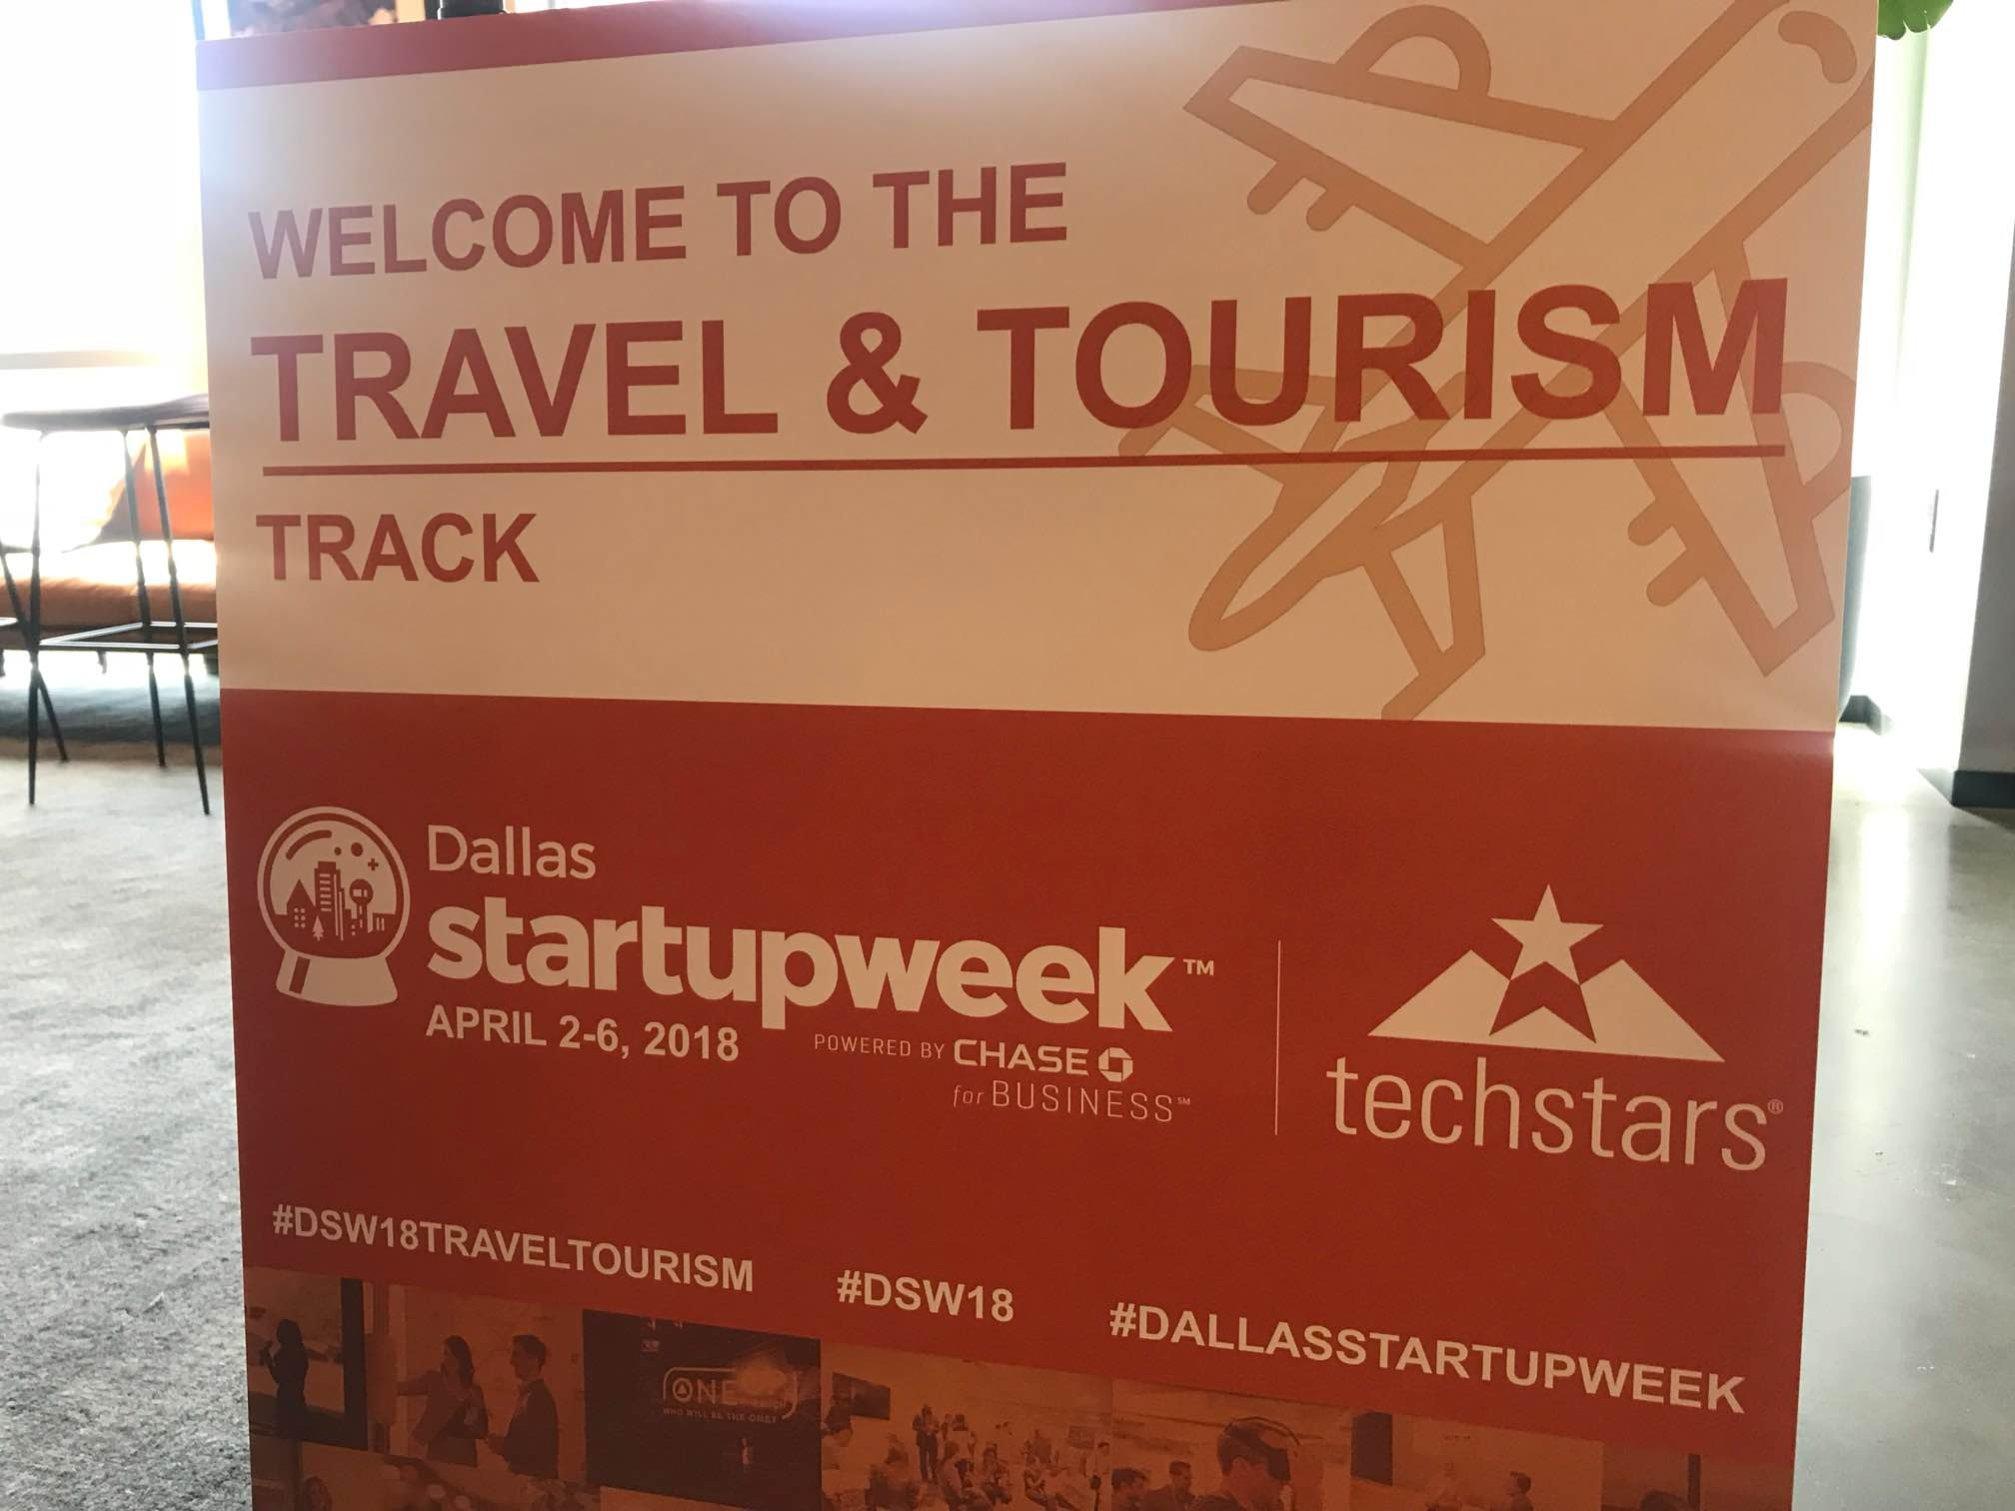 Travel & Tourism Track